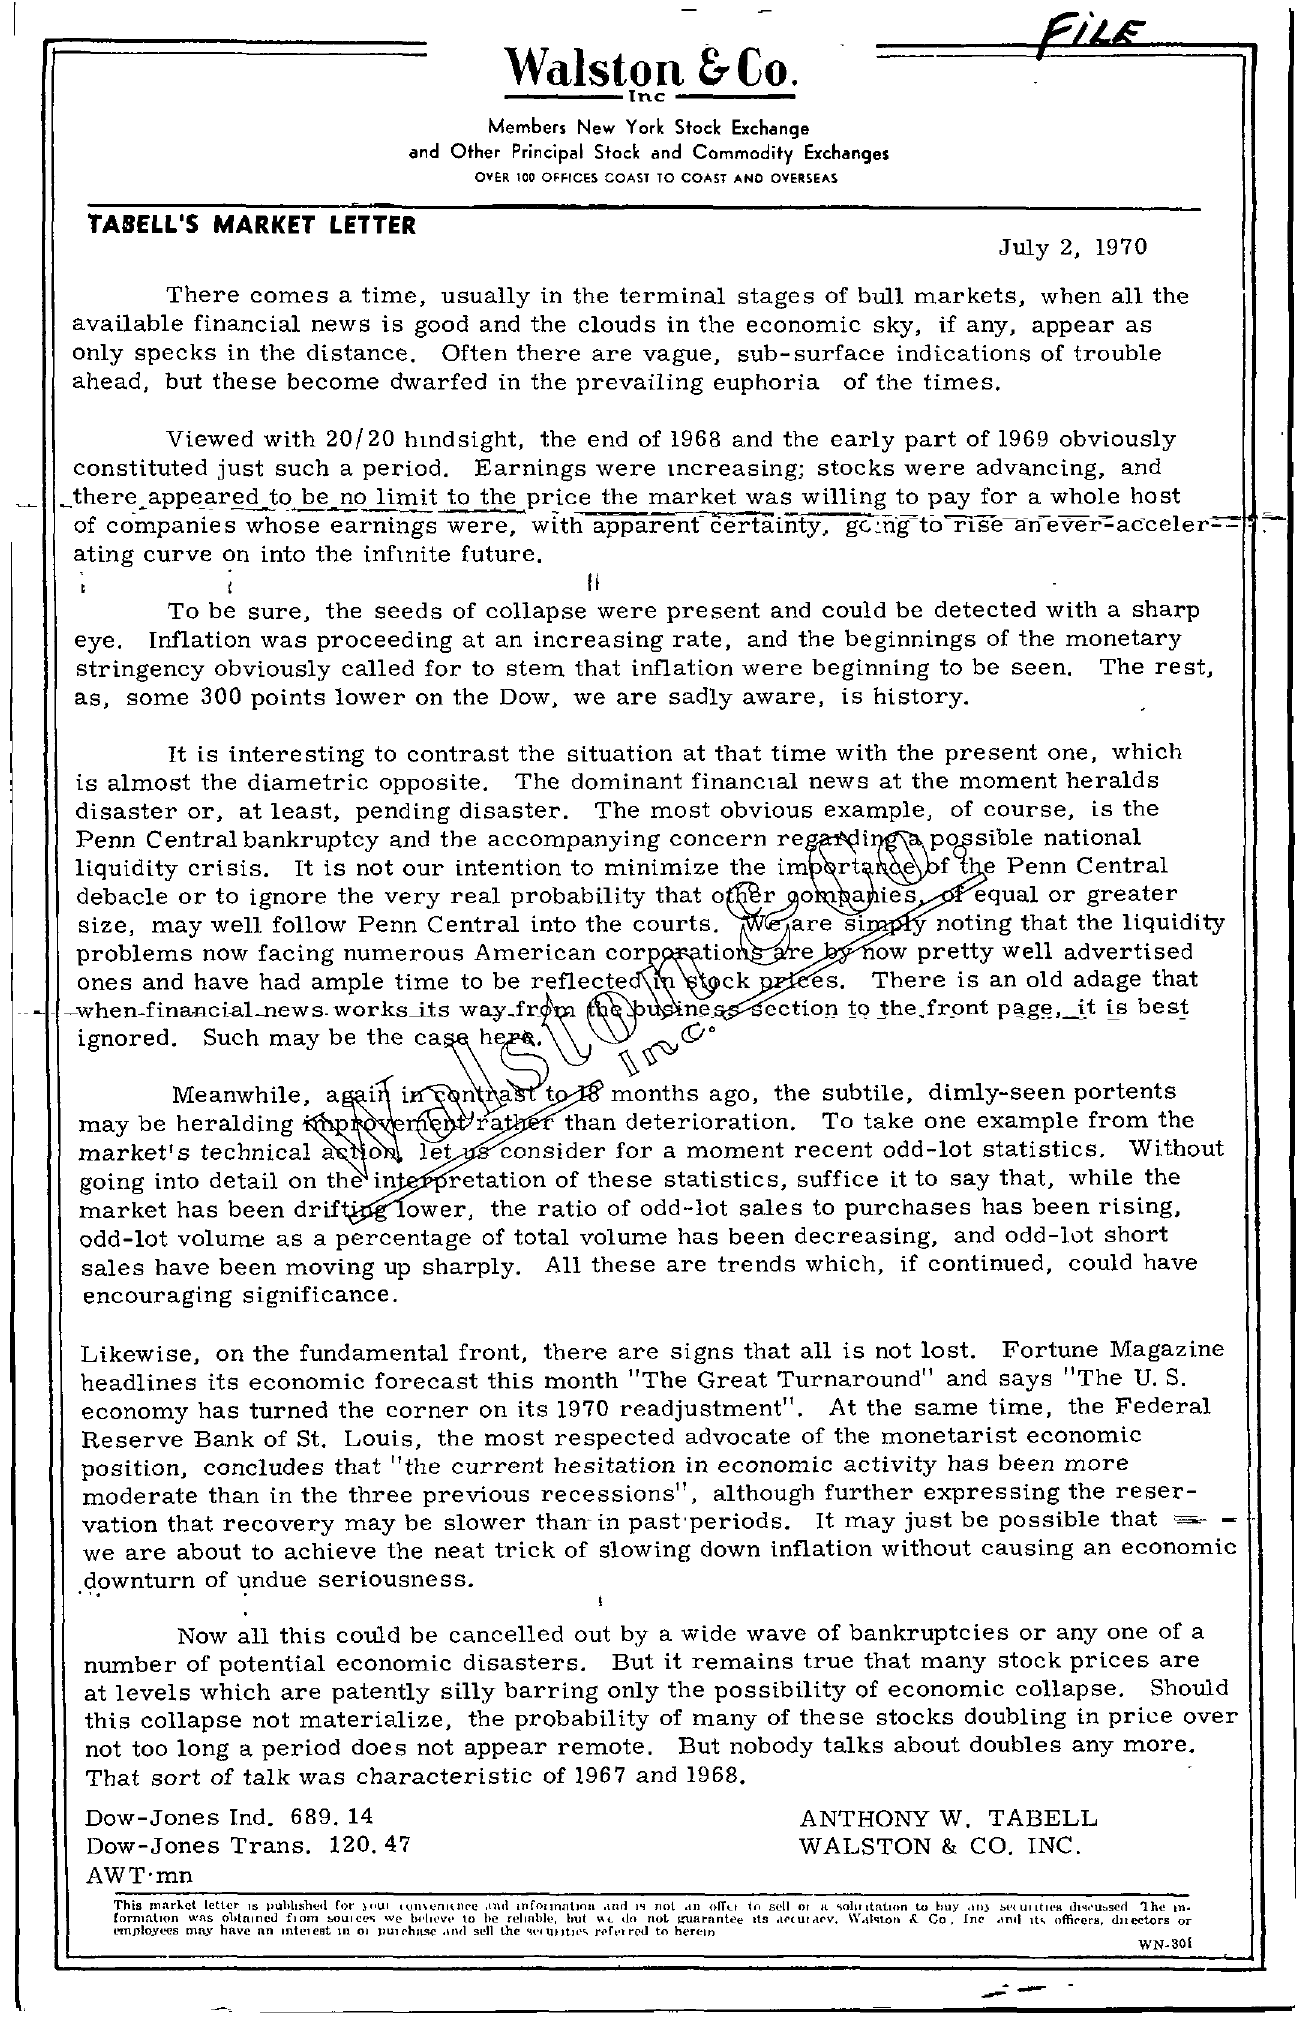 Tabell's Market Letter - July 02, 1970